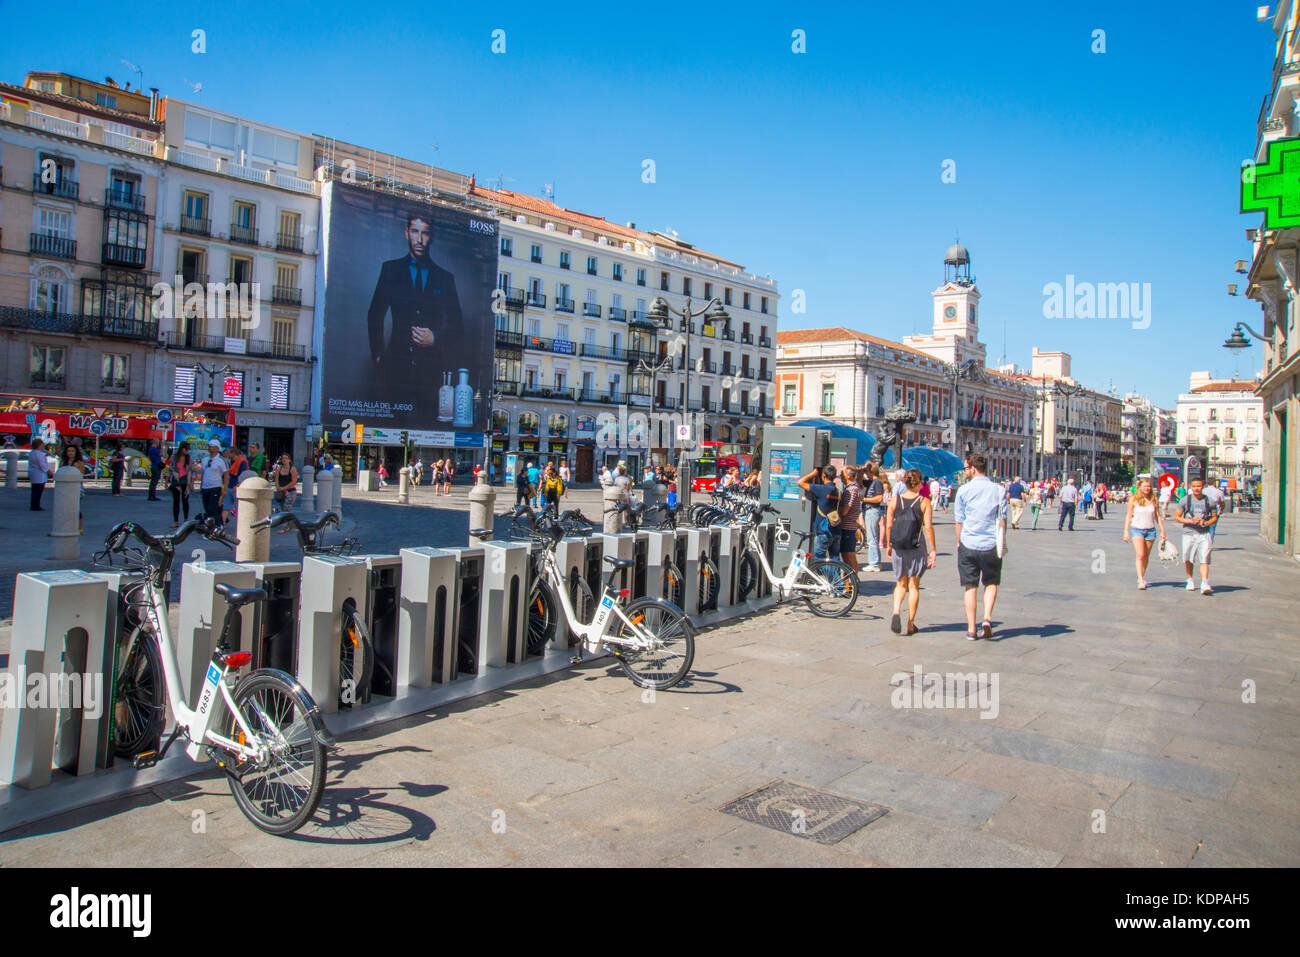 Bicicletas stock photos bicicletas stock images alamy for Parking puerta del sol